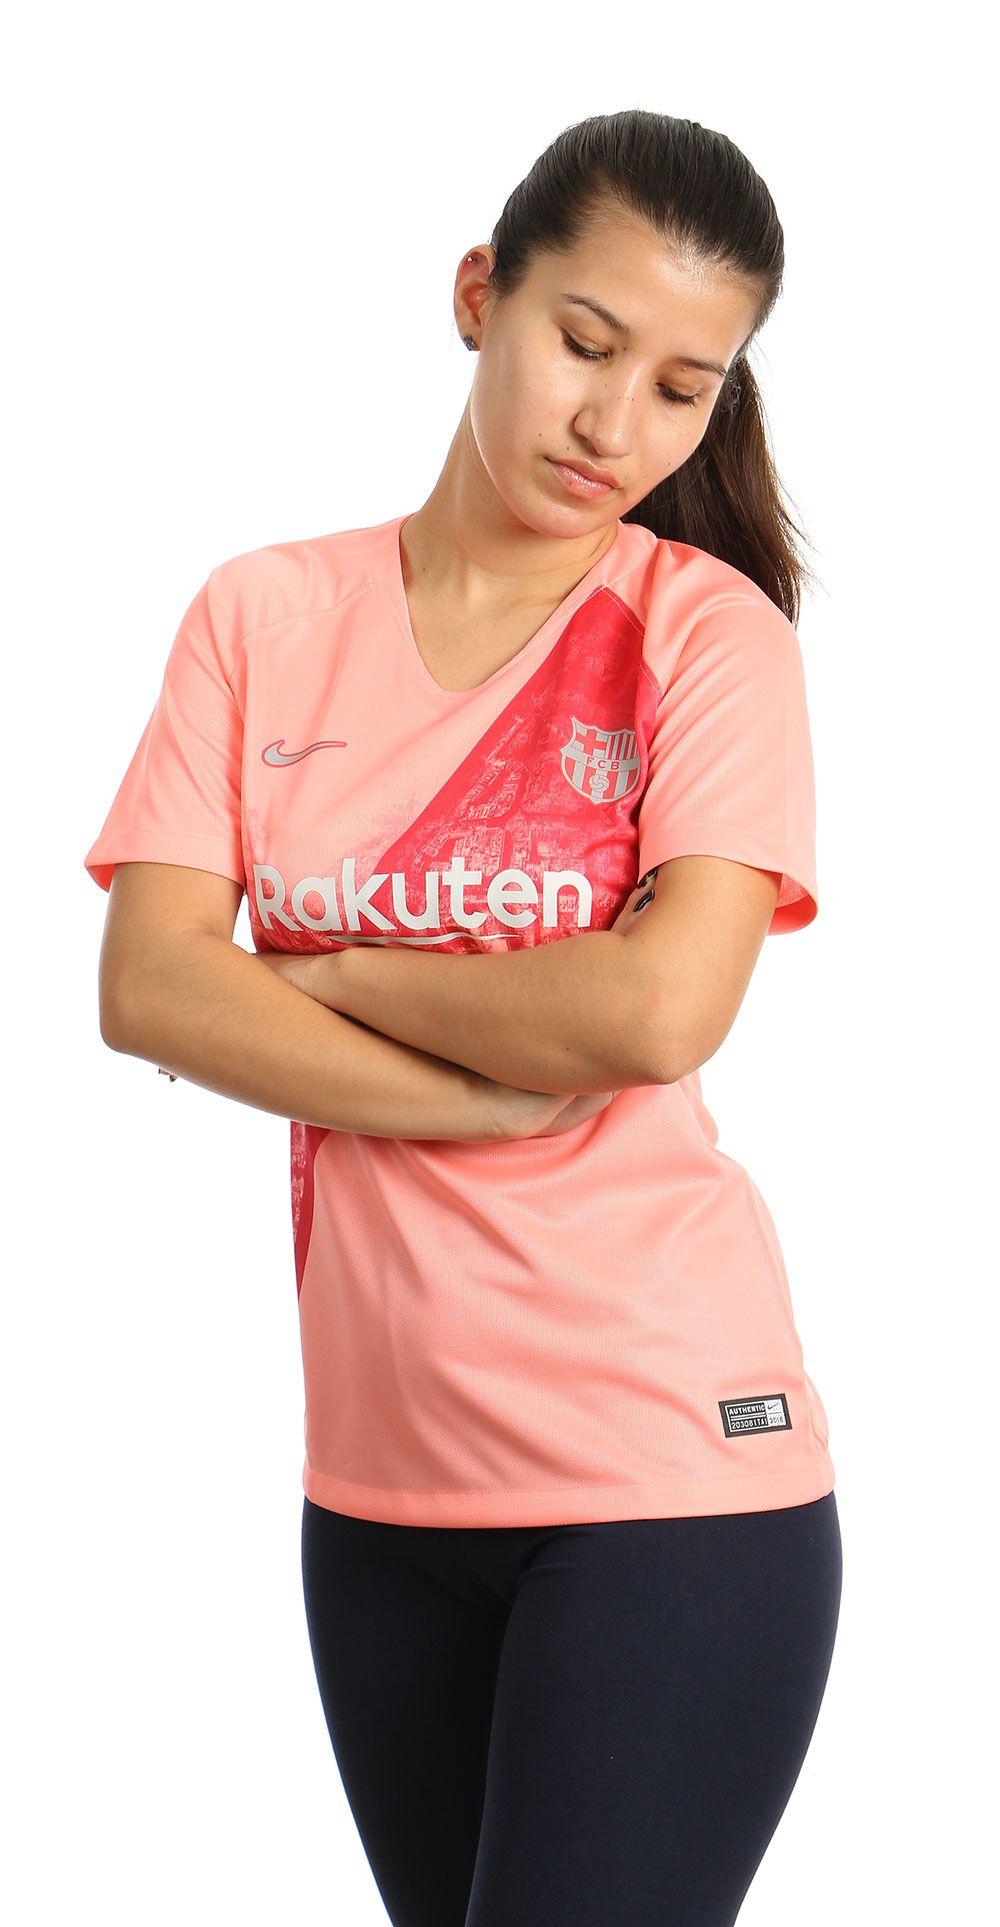 Camiseta mujer Barcelona rosa.  futbolmania  Barca  Barcelona  fcbarcelona   Nike  catalunya  LaLiga  ChampionsLeague  footballcollection   footballculture ... 2c4e309b7daa7